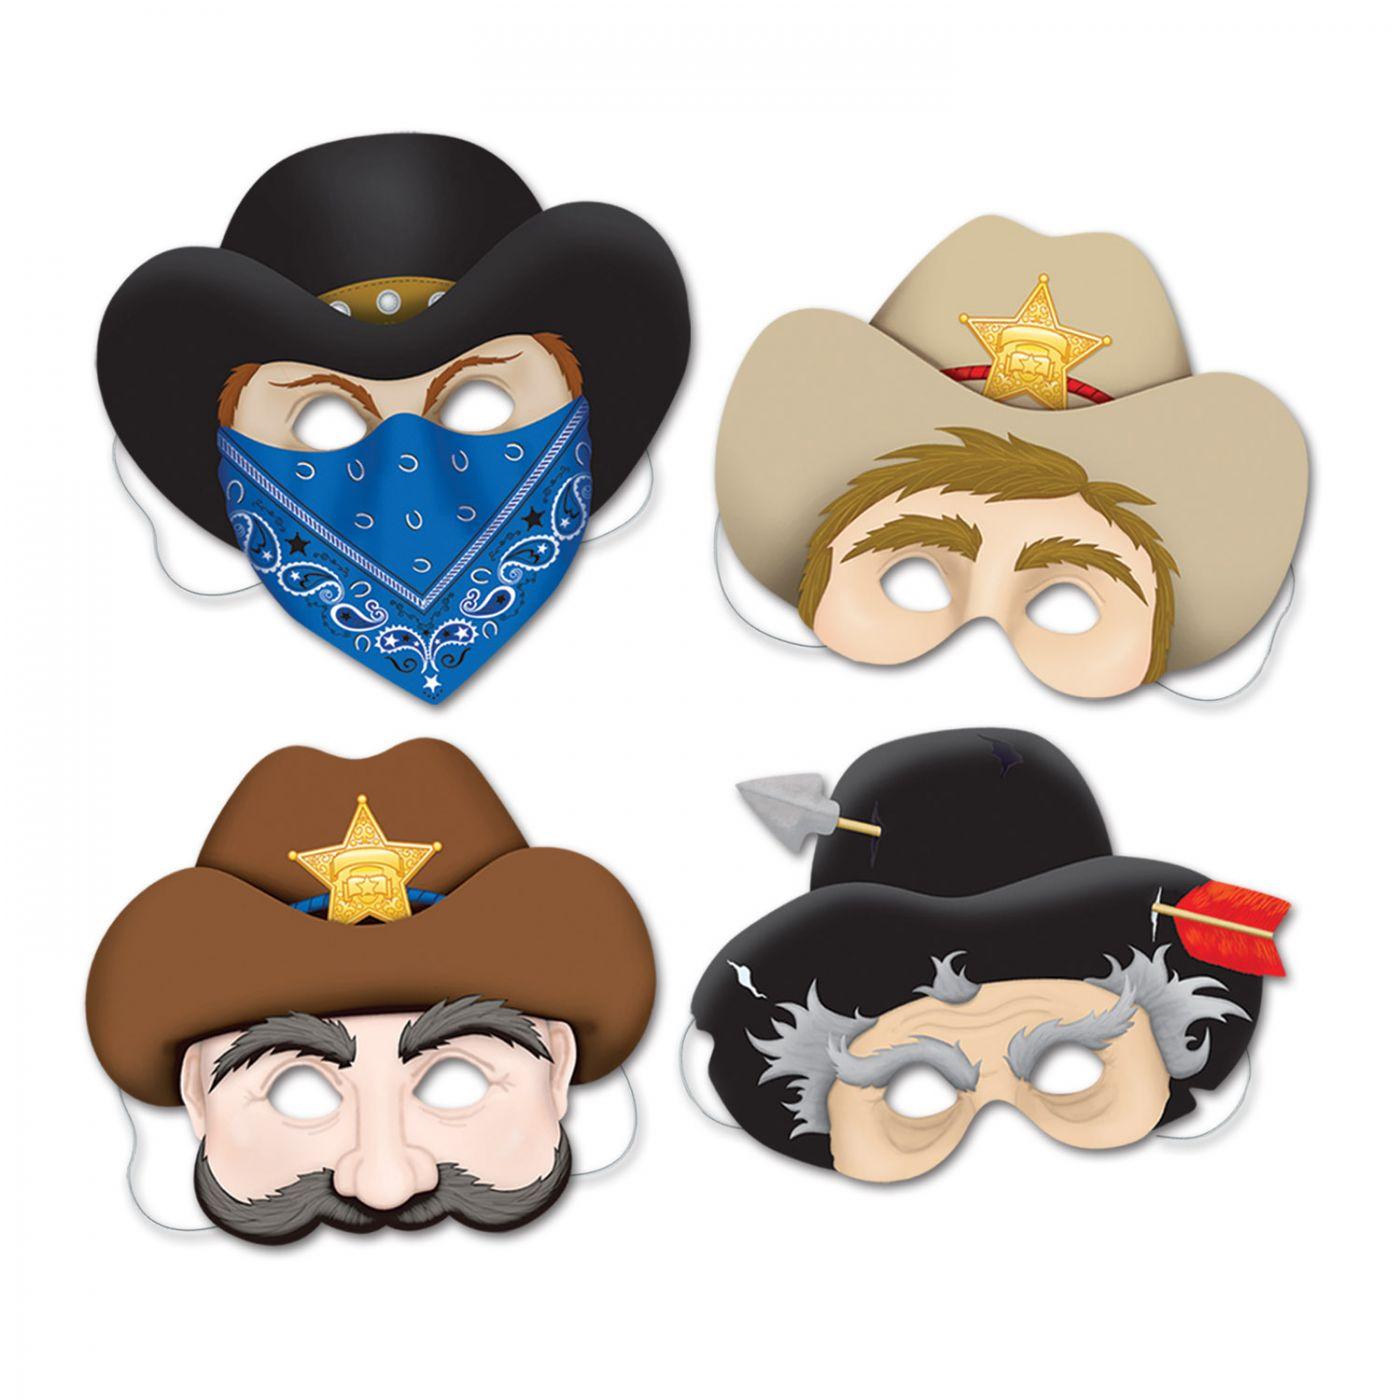 Western Masks image